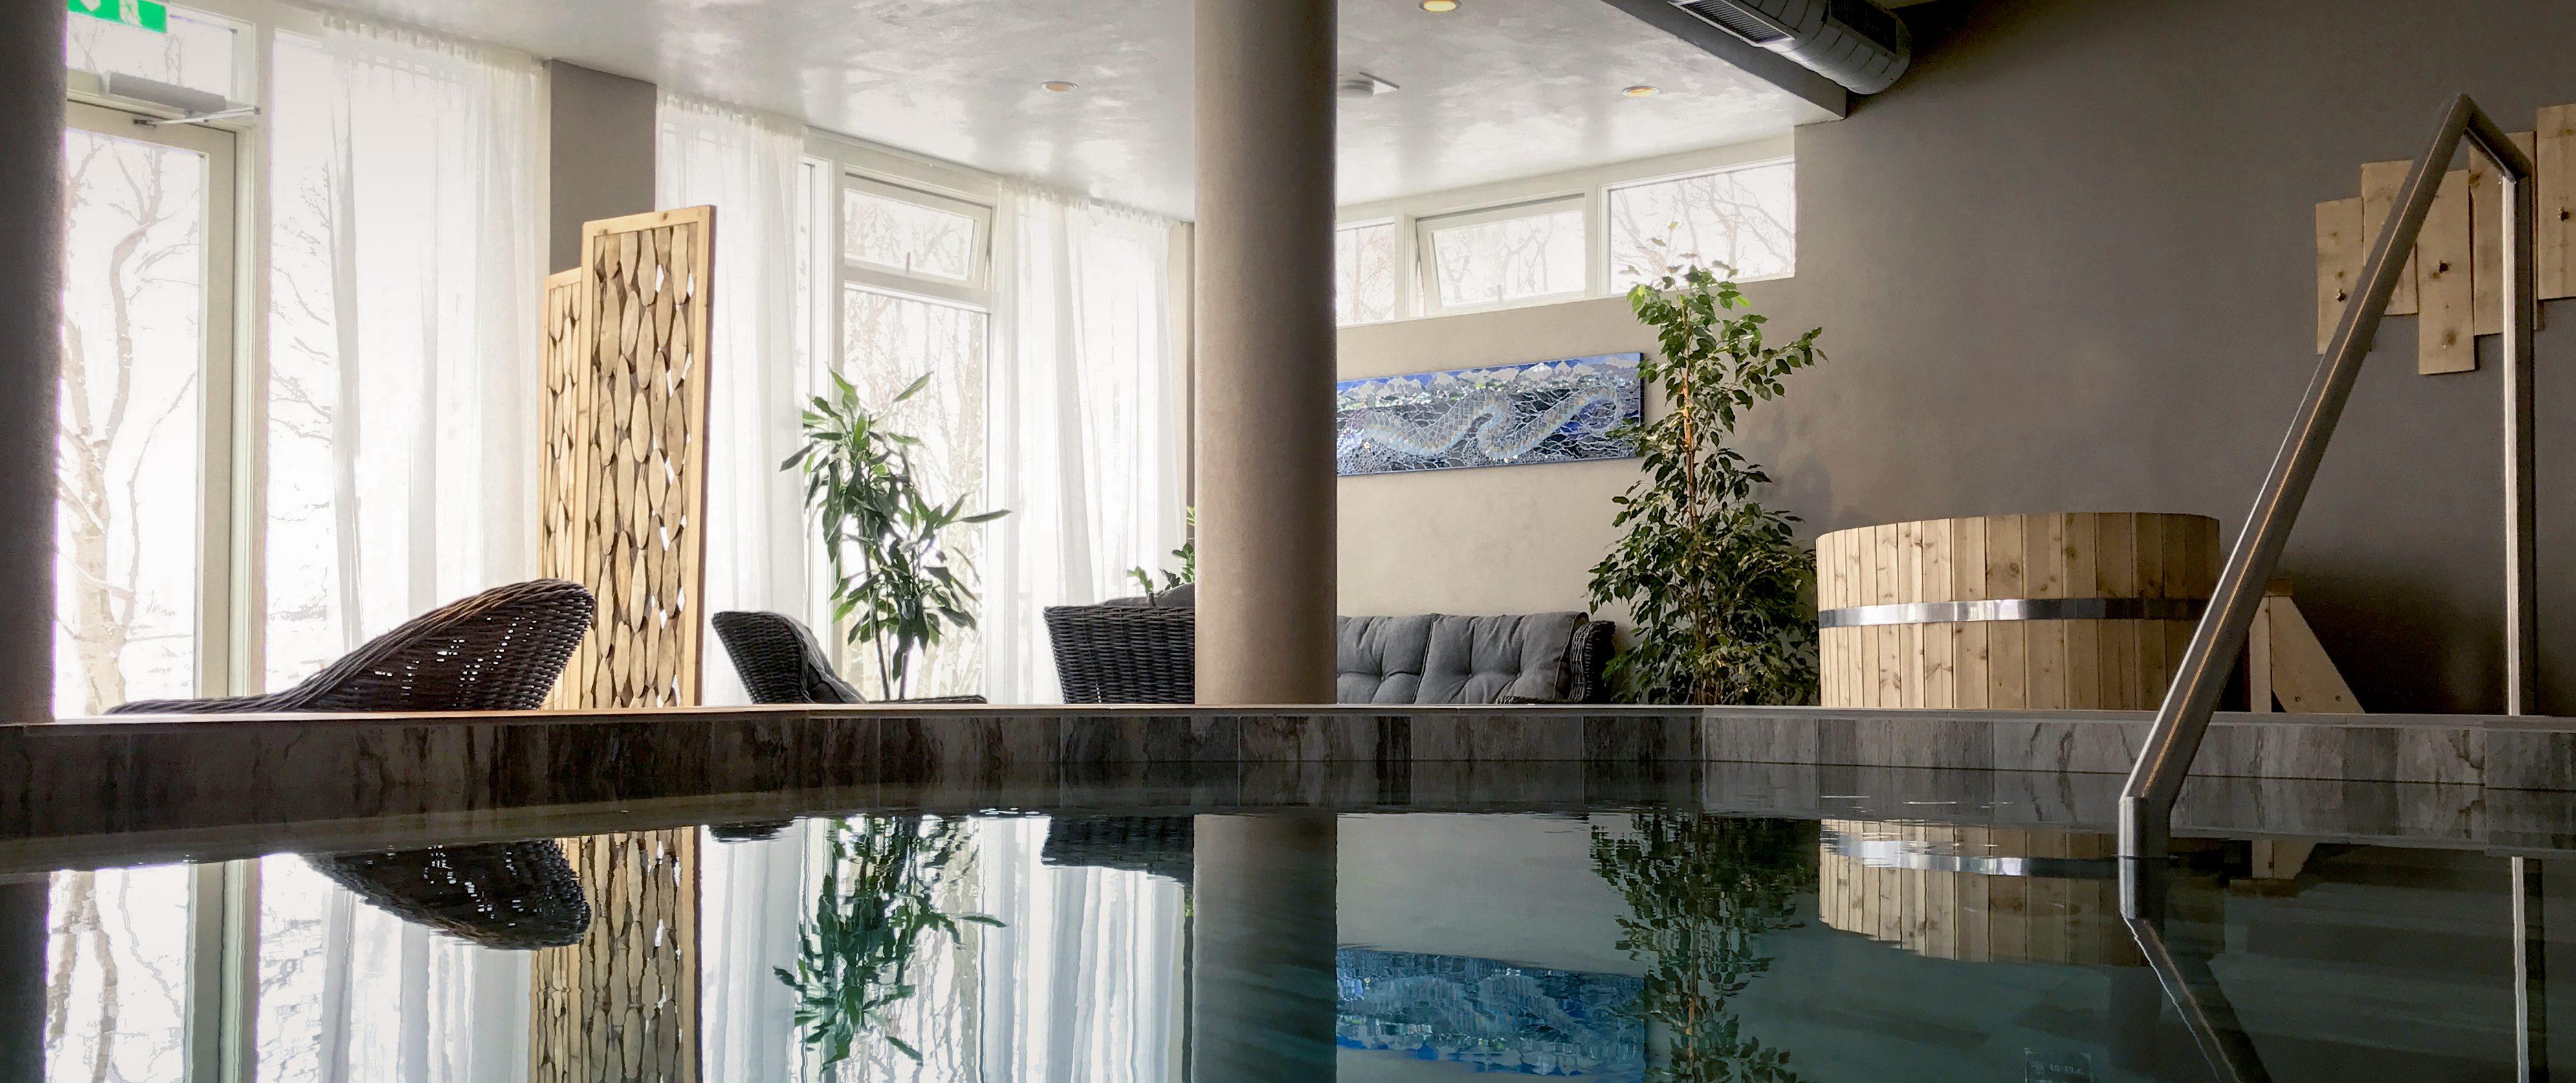 island-lake-hotel-spa-wellness-bereich-panorama